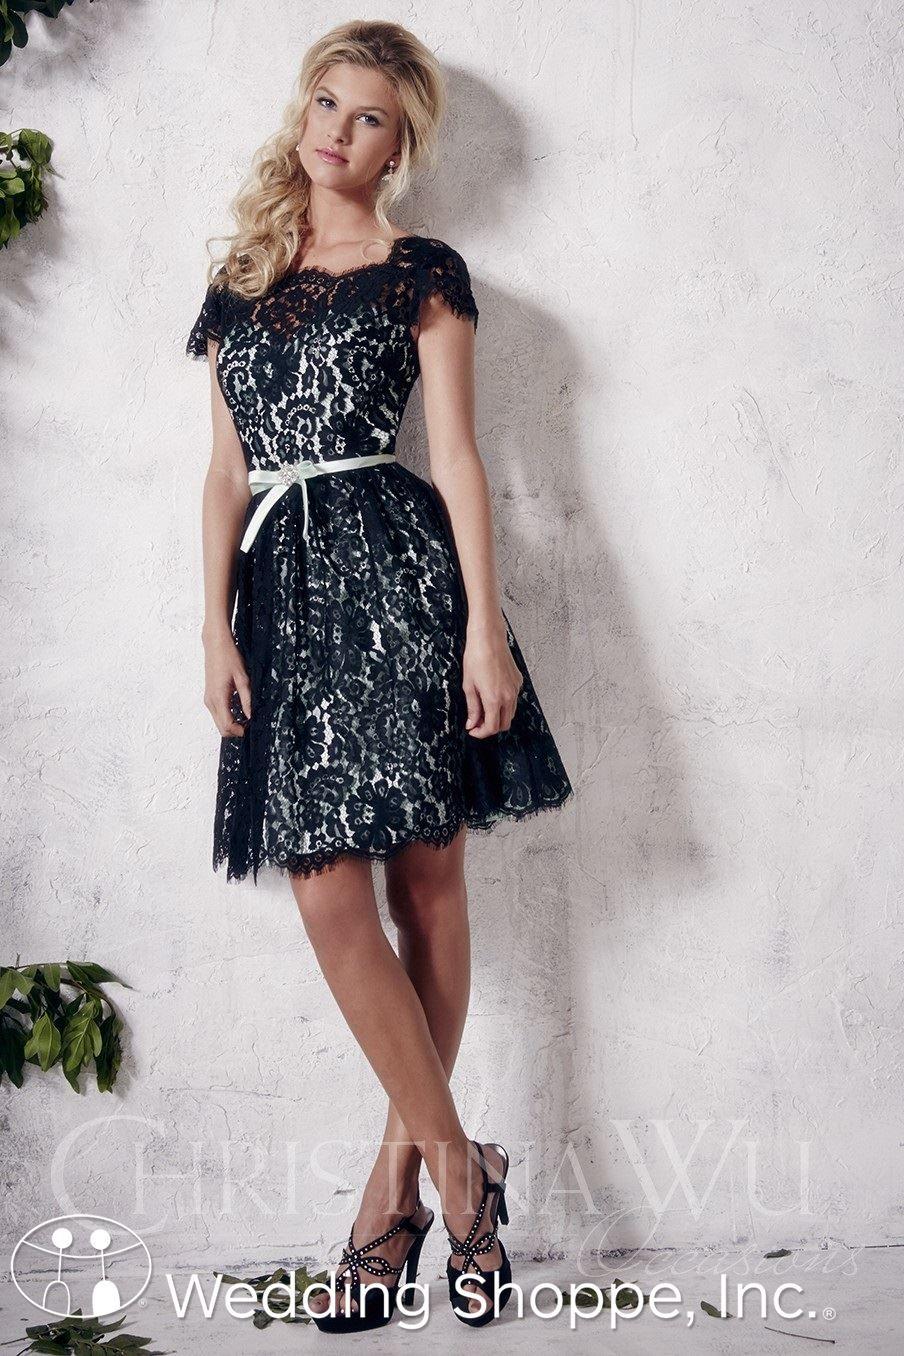 Christina wu wedding dresses  Christina Wu Bridesmaid Dress   Pinterest  Christina wu and